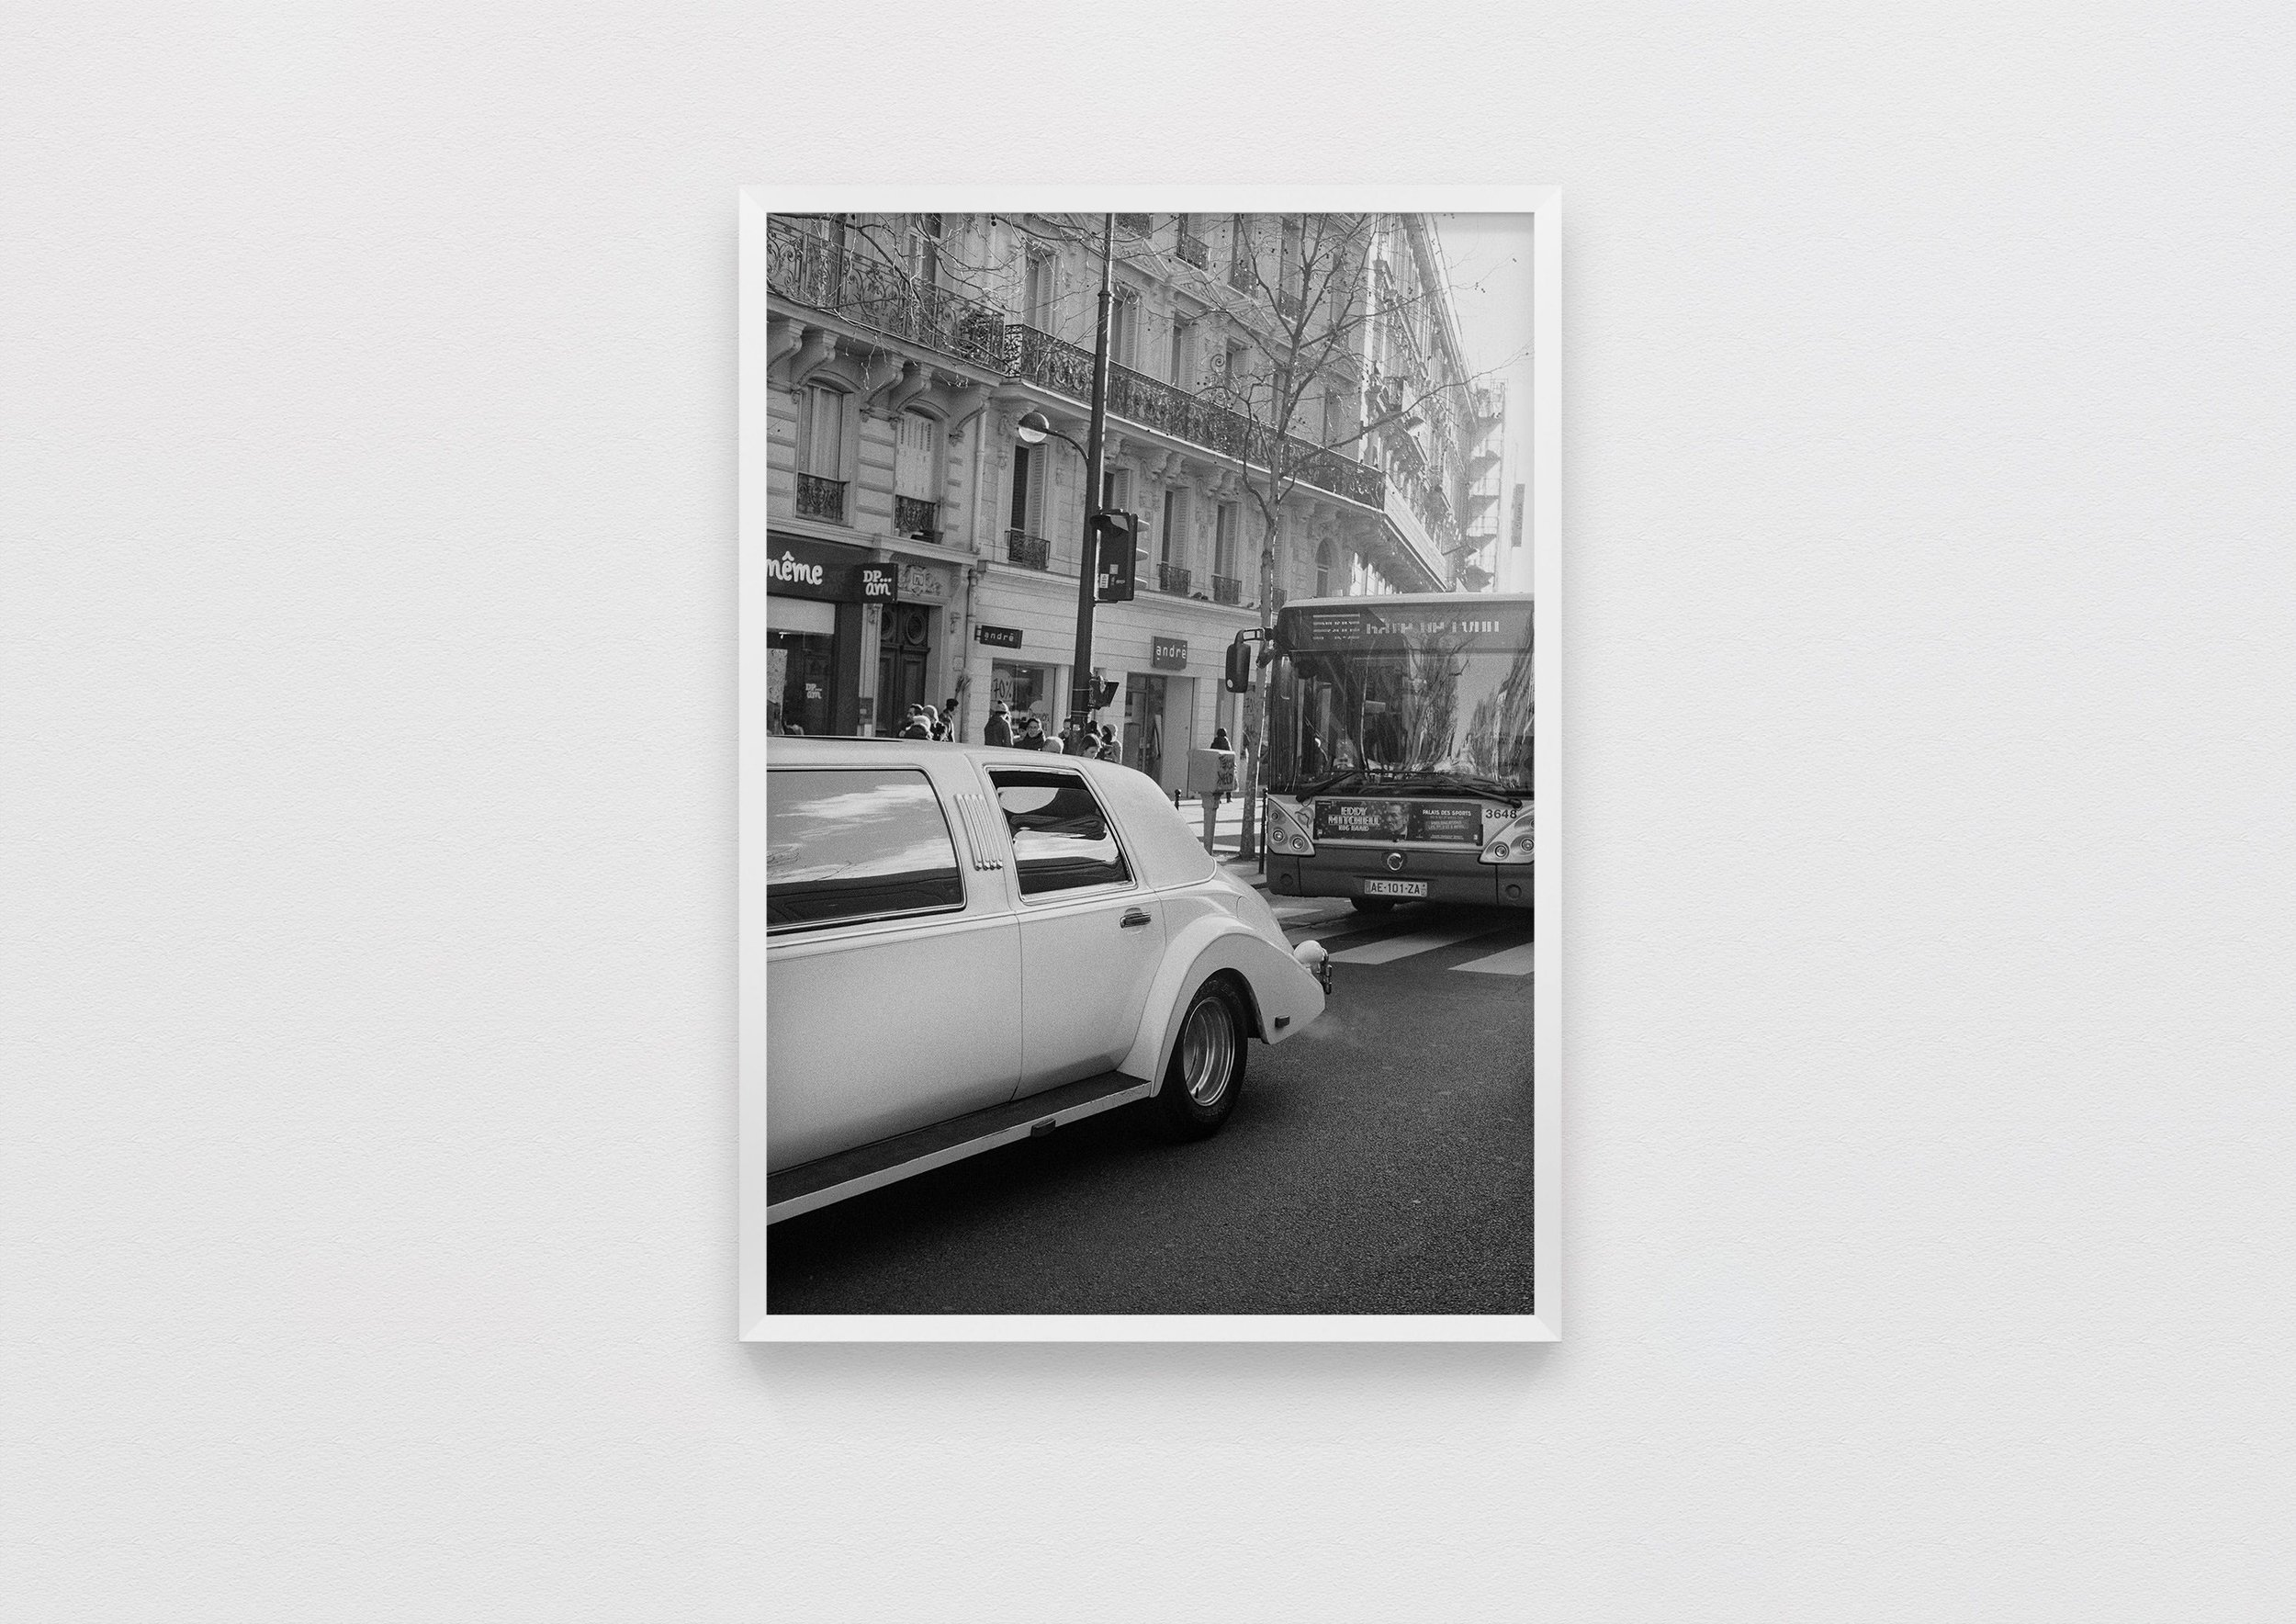 traffic  Paris, France 2017  50 x 70 Archival Print